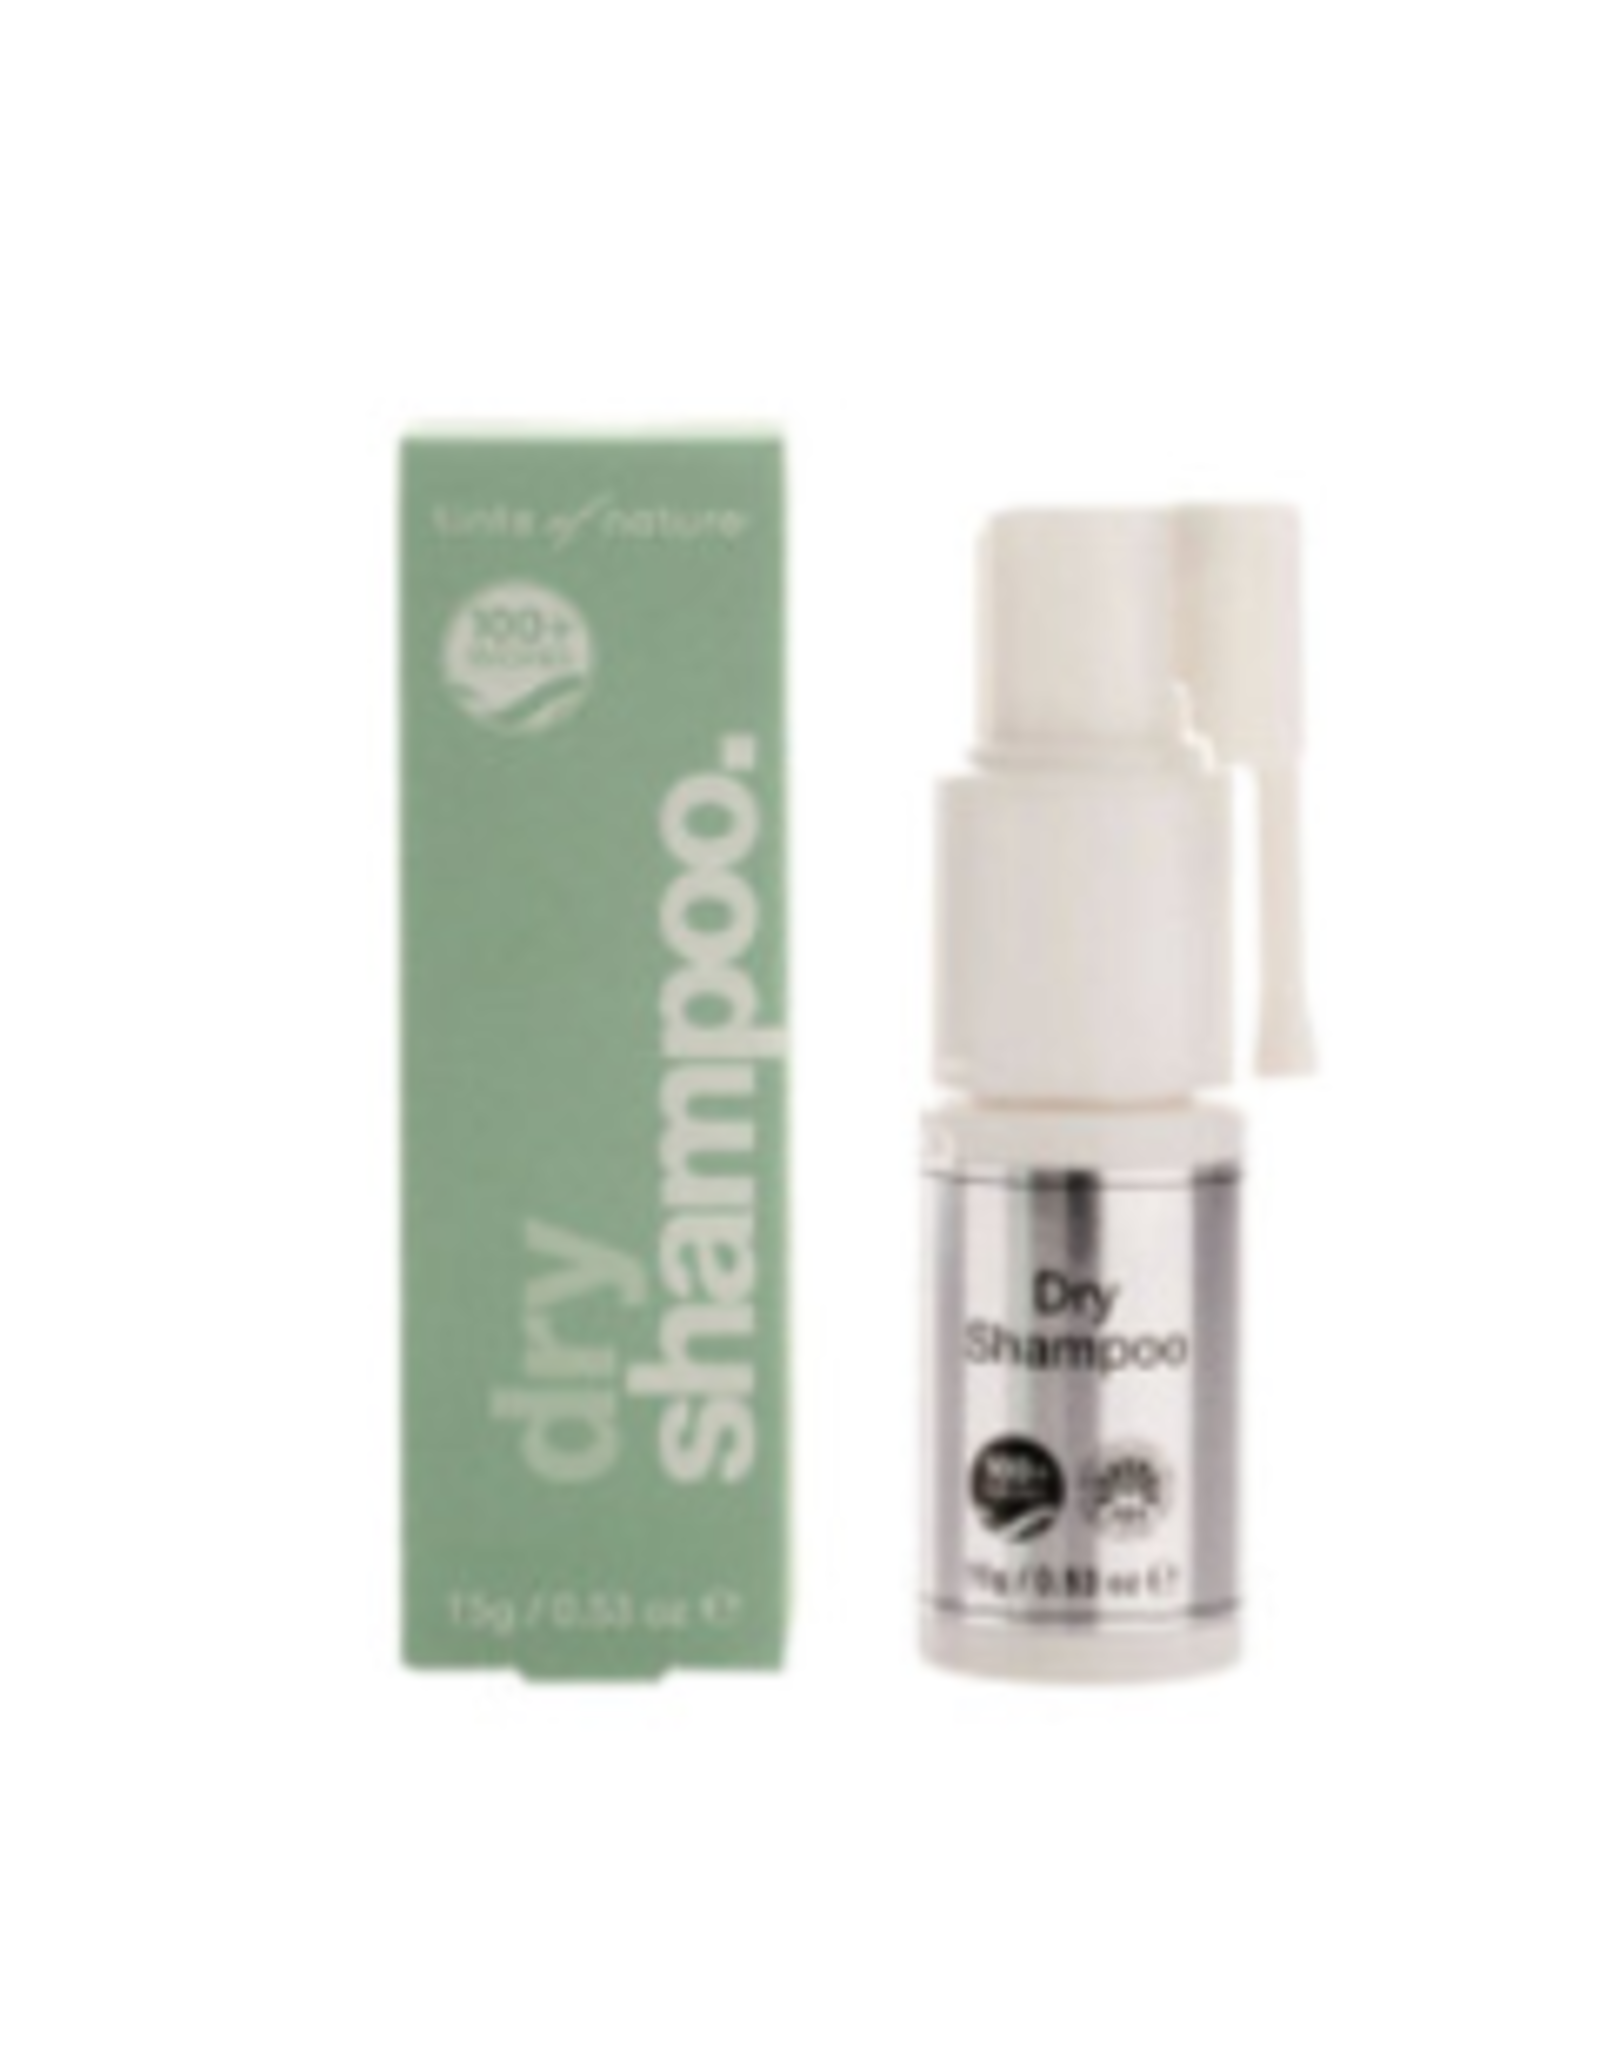 Tints Of Nature Dry Shampoo Powder Spray 15g (Non aerosol)